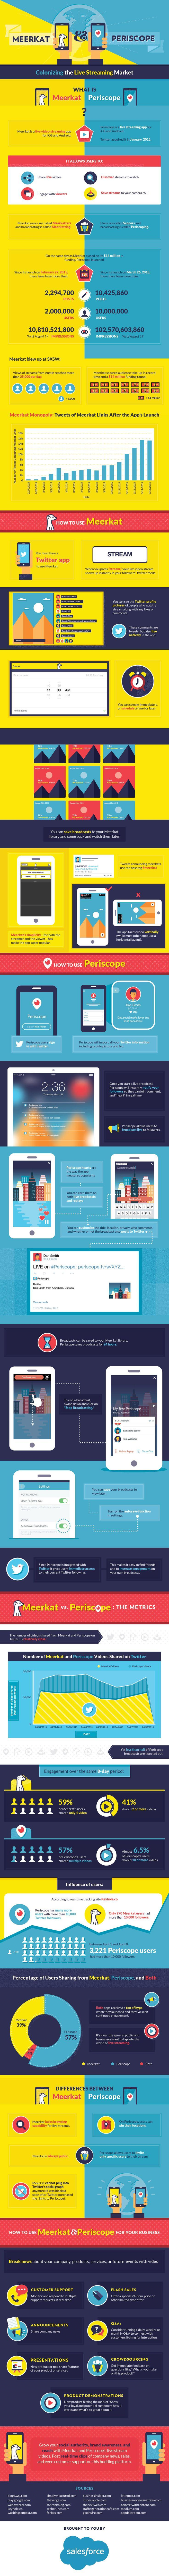 Infografik: Meerkat und Periscope im Marketing. (Grafik: Salesforce)